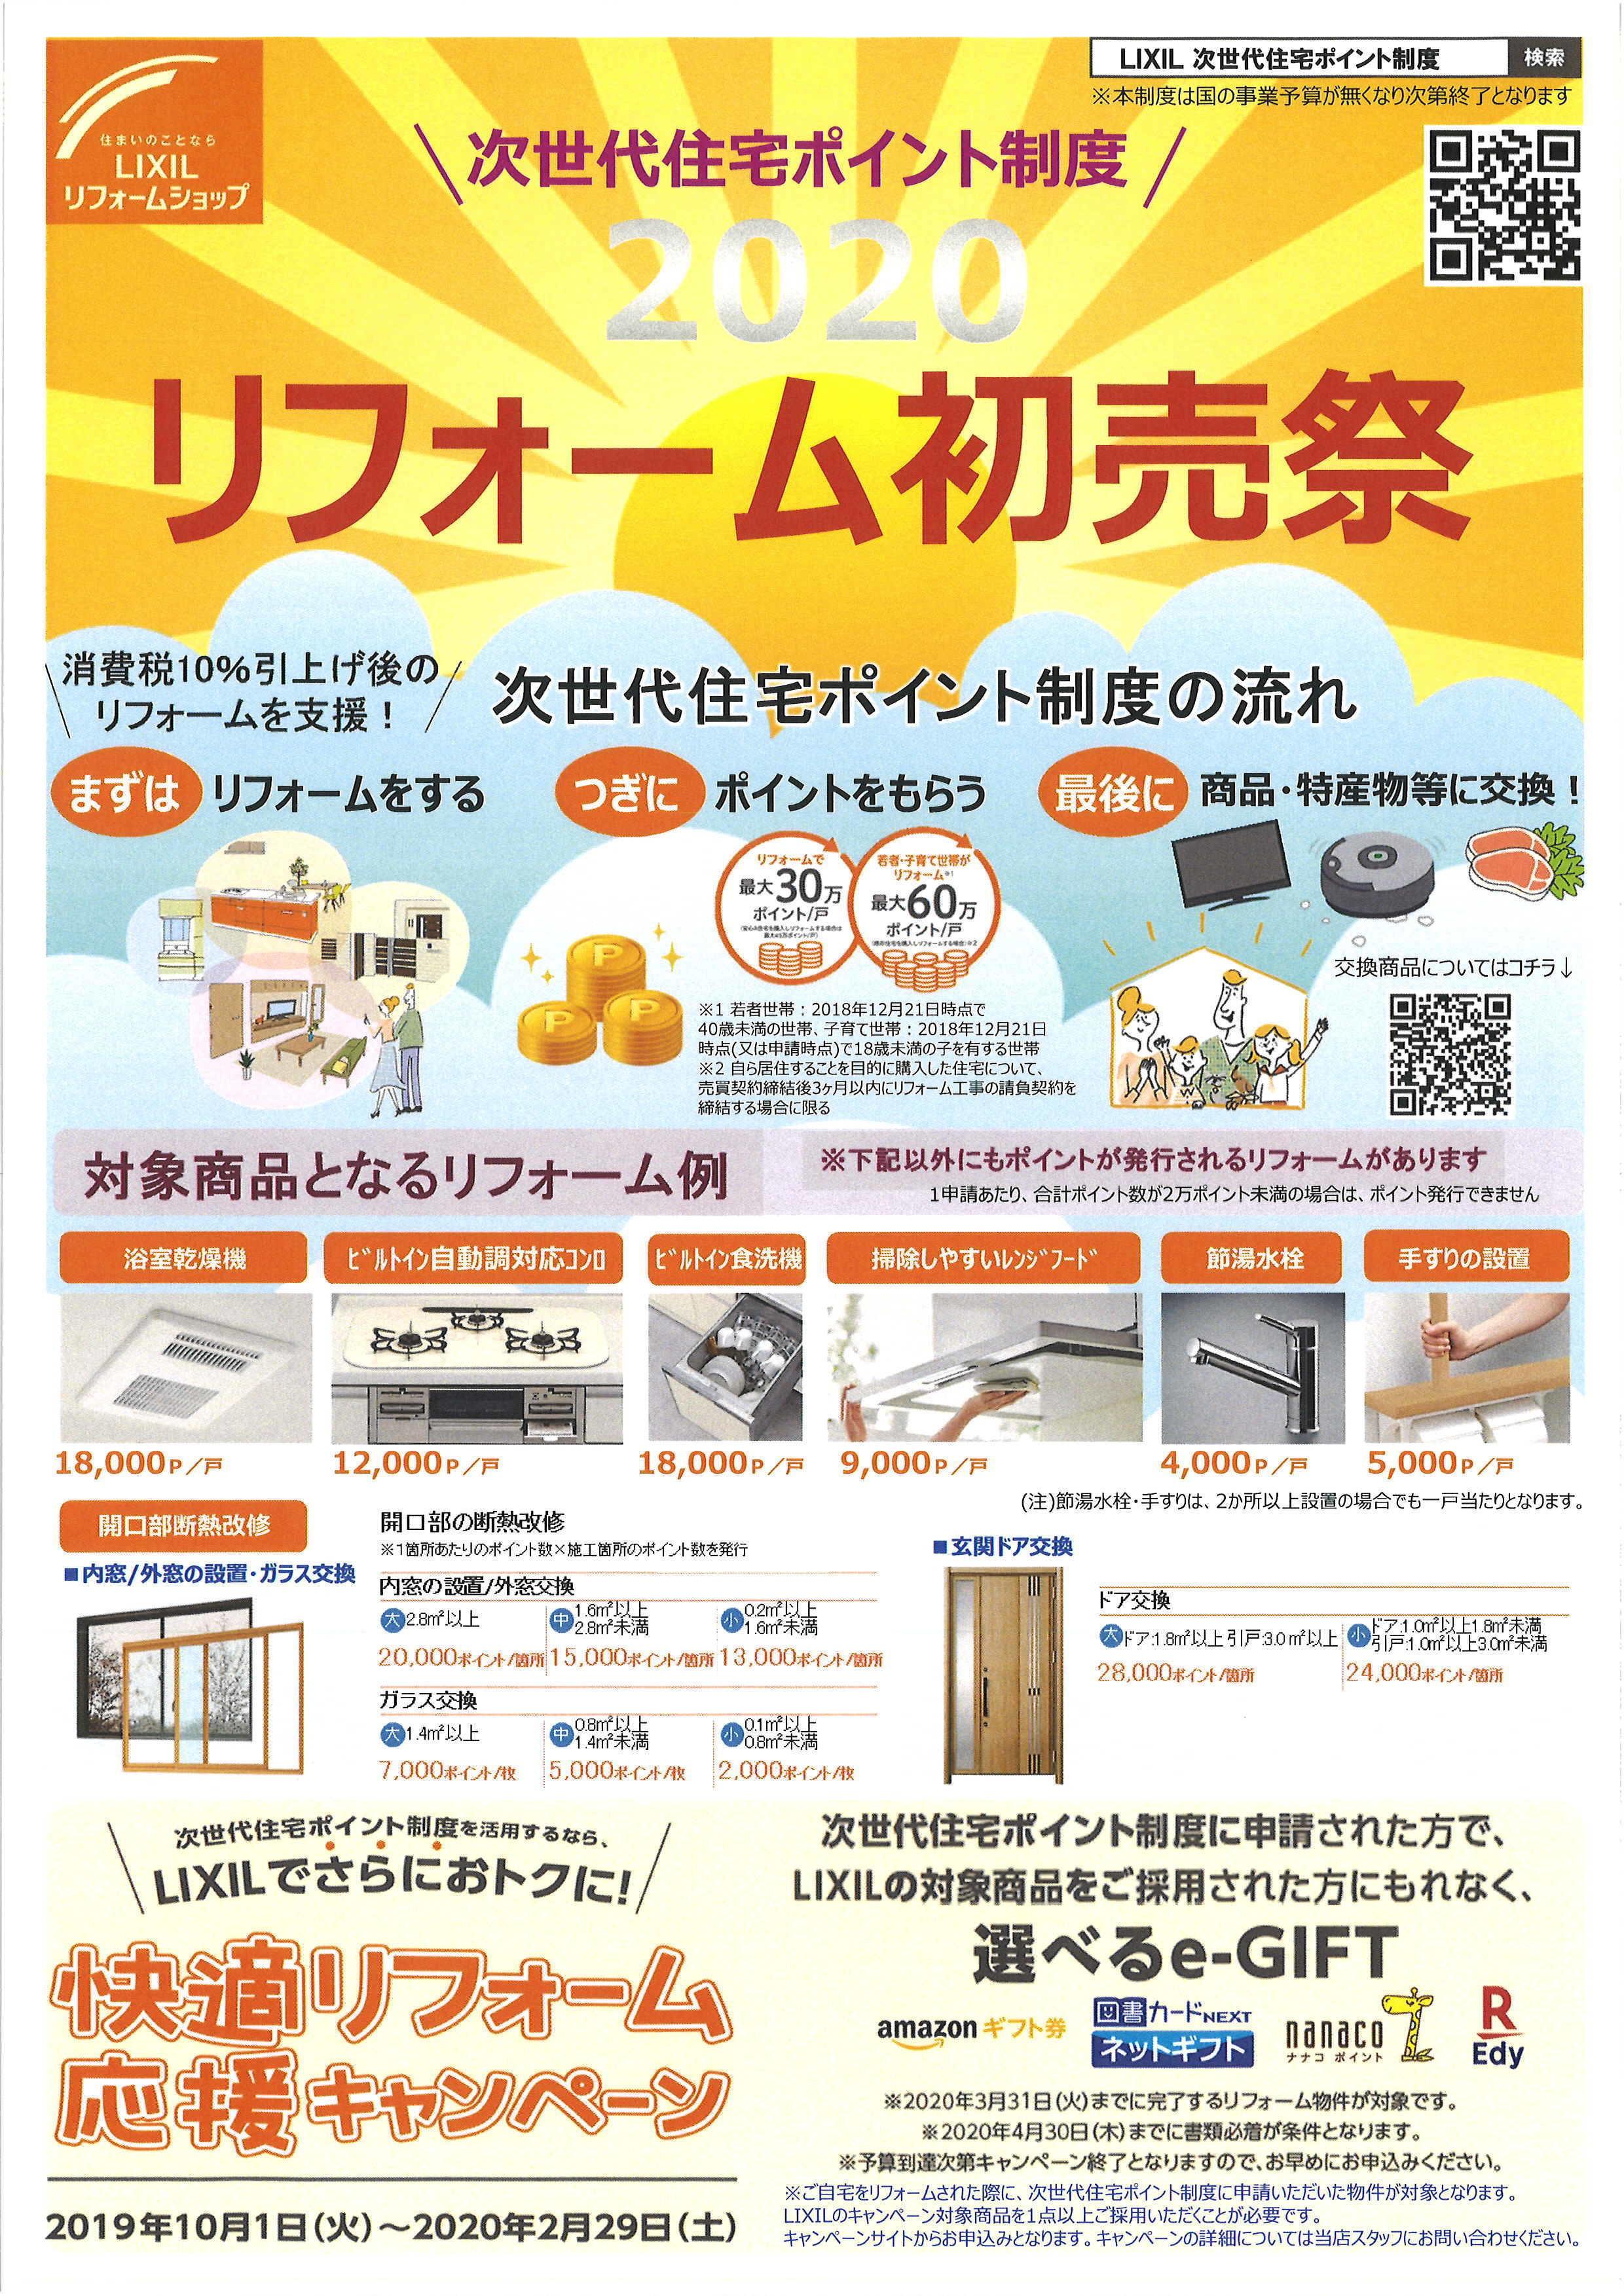 https://lixil-reformshop.jp/shop/SC00111026/photos/b5bcf552284d110239ae5b982a4758de6917afd5.jpg